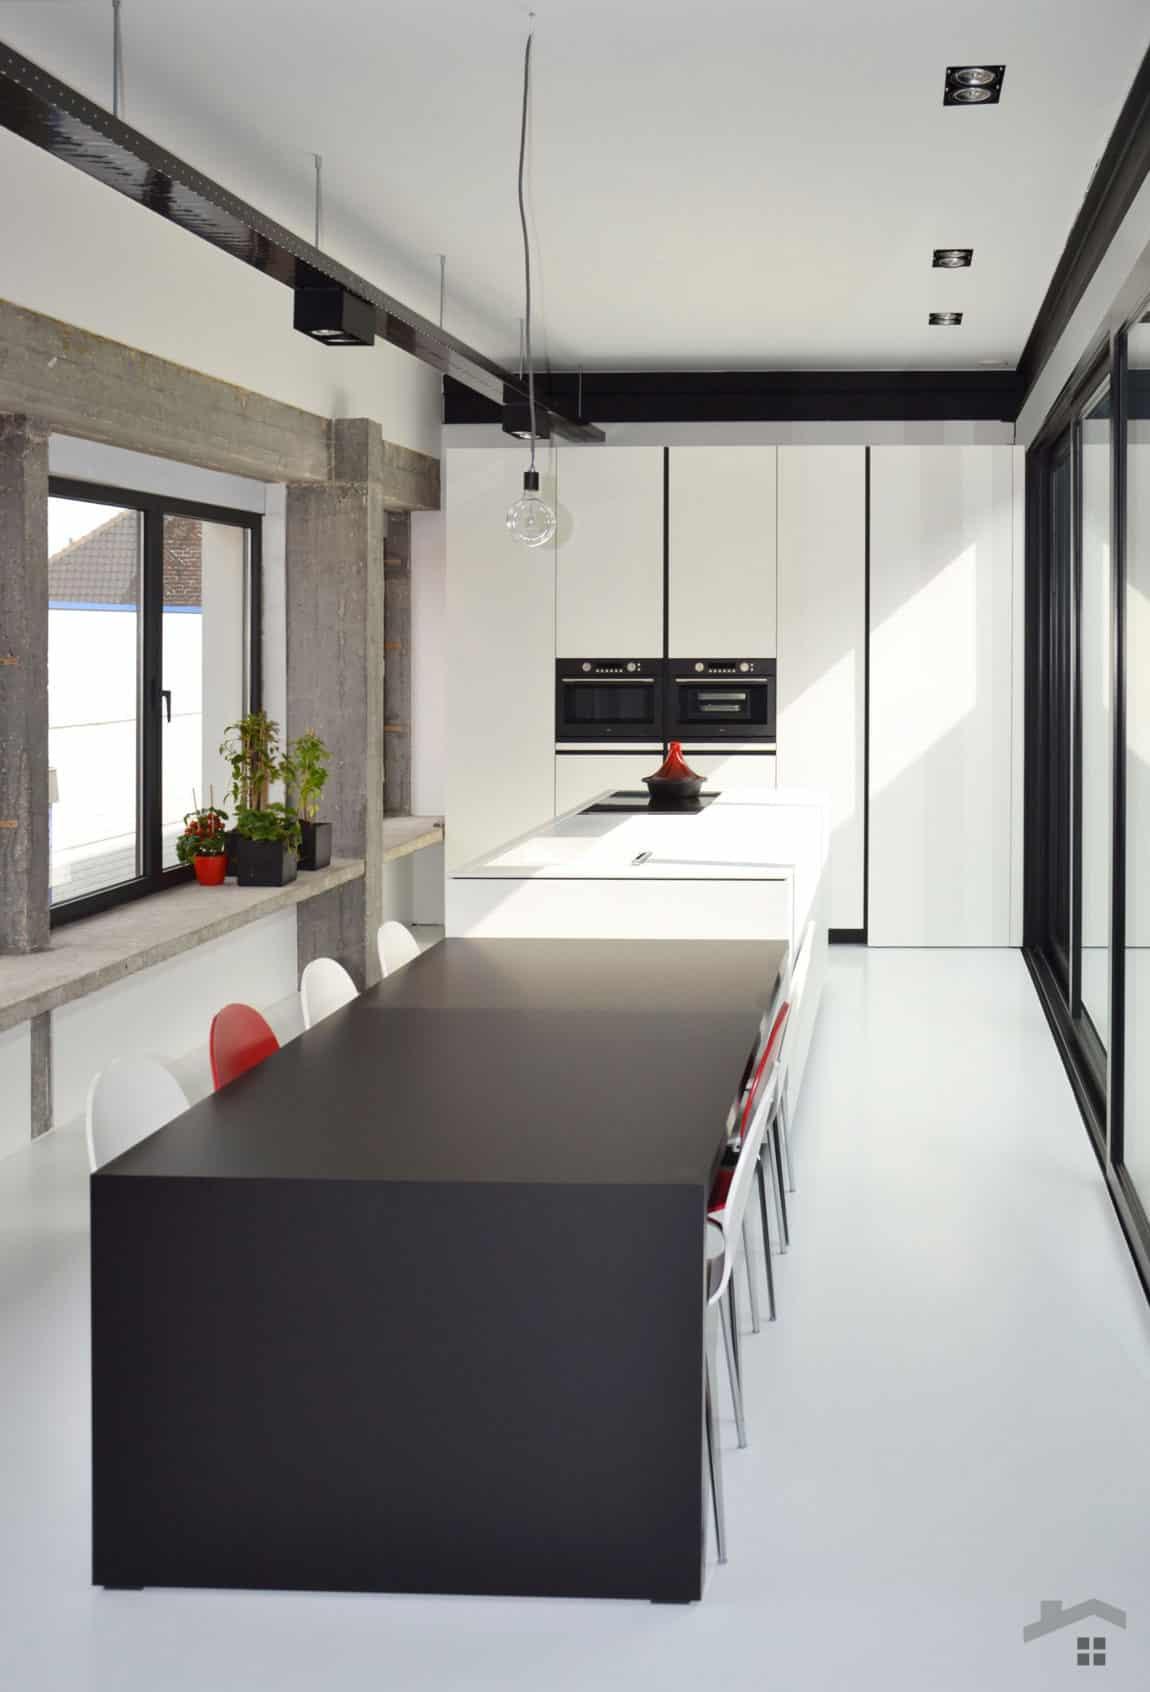 Loft 8 by Aeon Architecten (7)